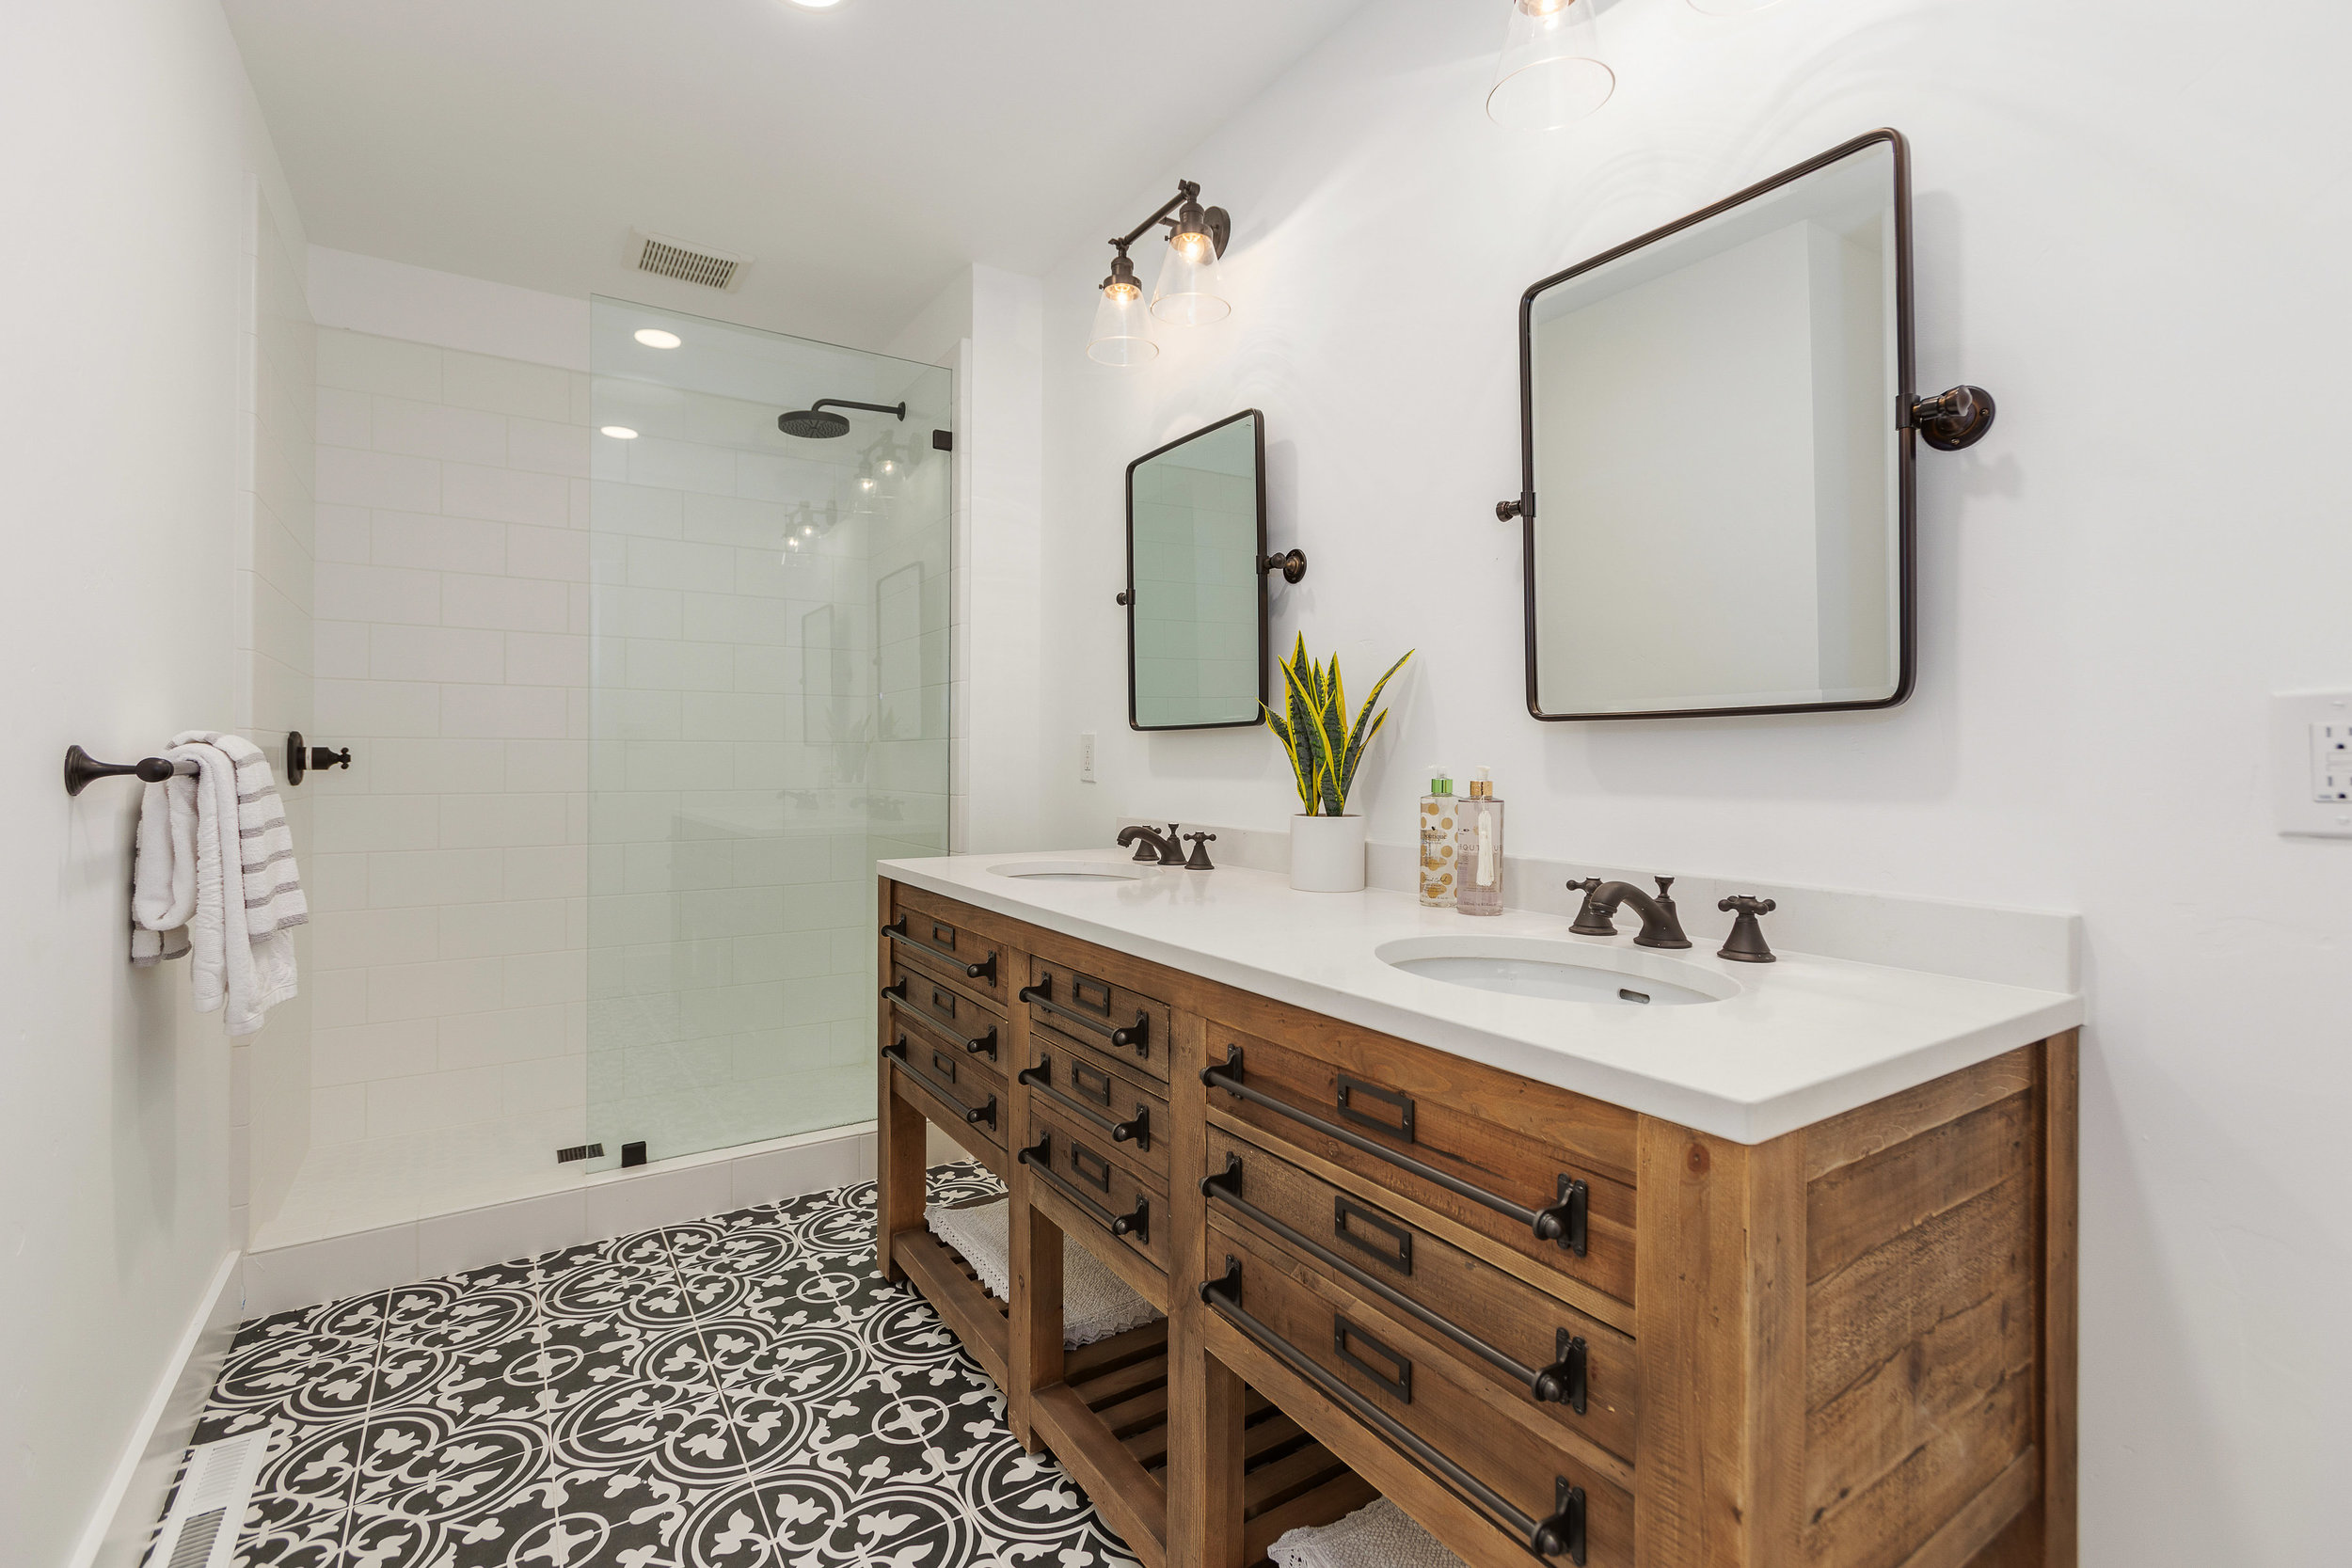 026_143-Bathroom.jpg